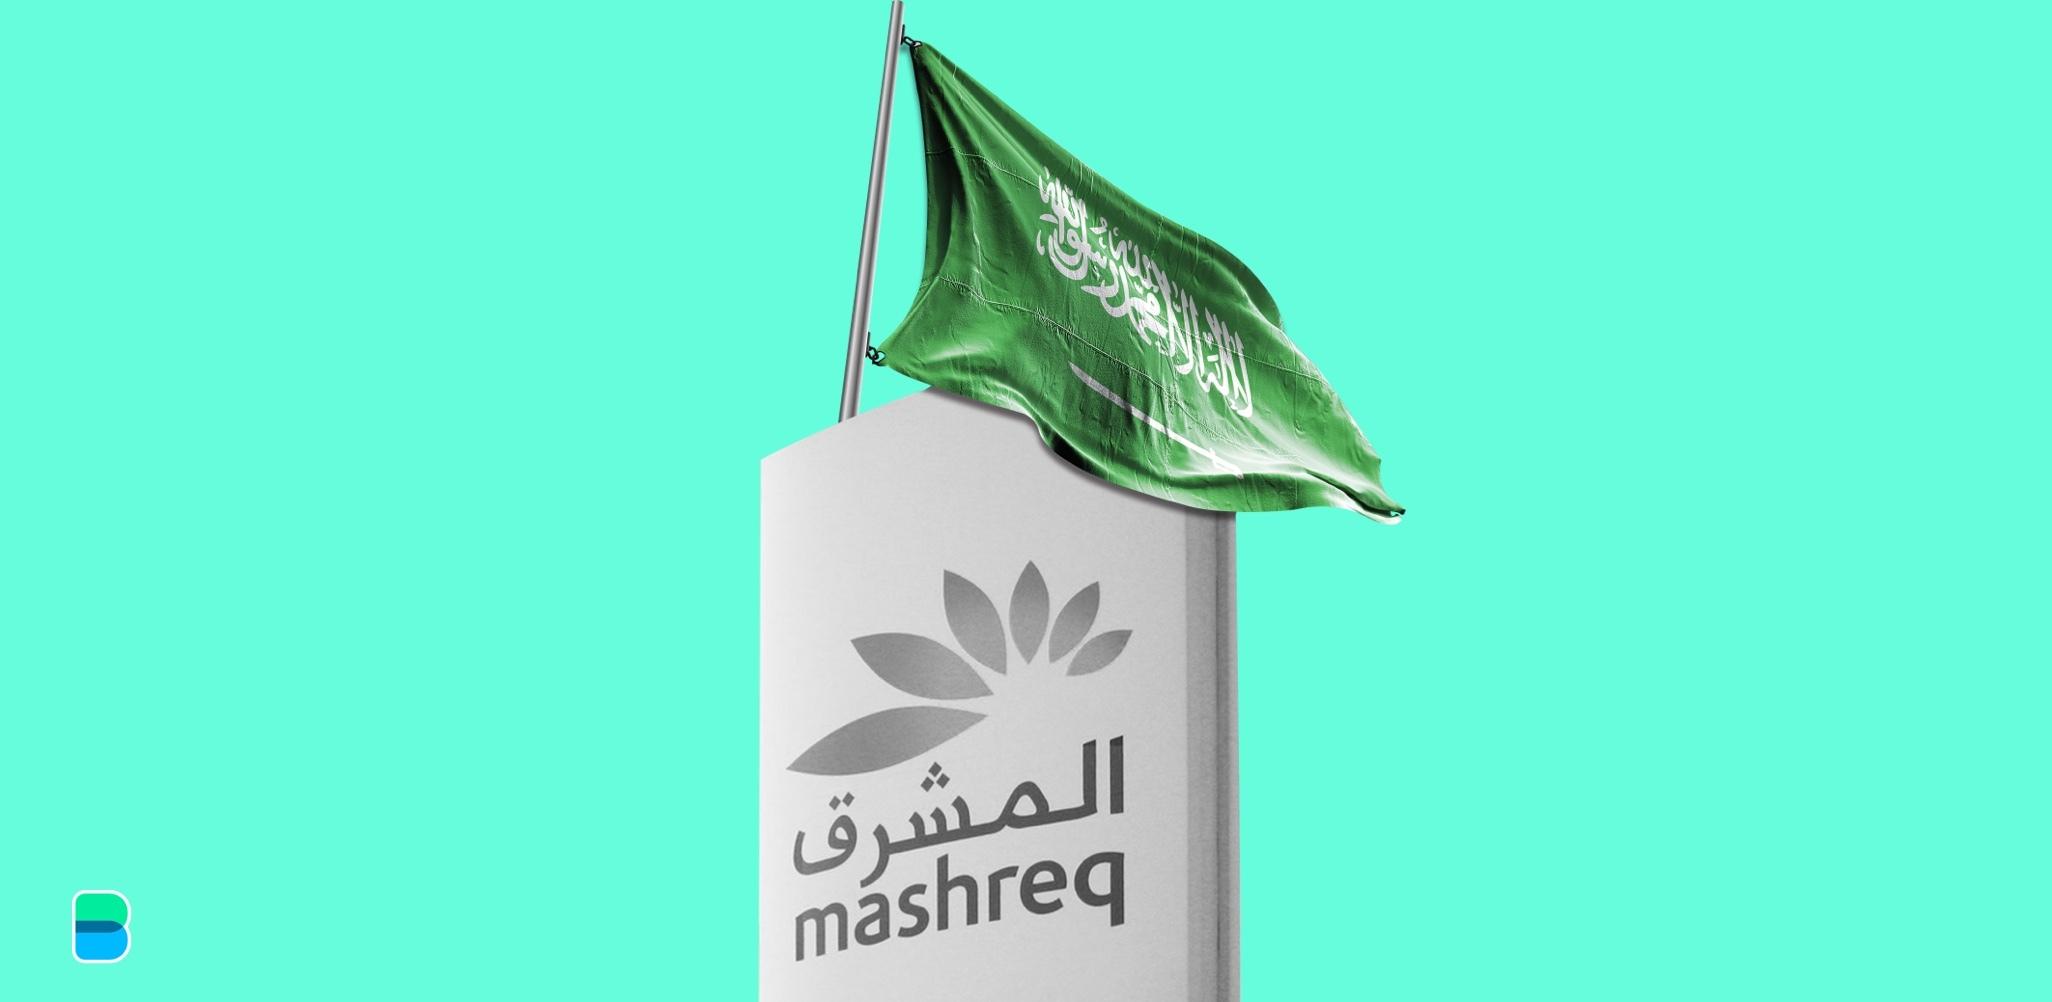 🕋 Saudi Arabia — a banking and pilgrimage destination